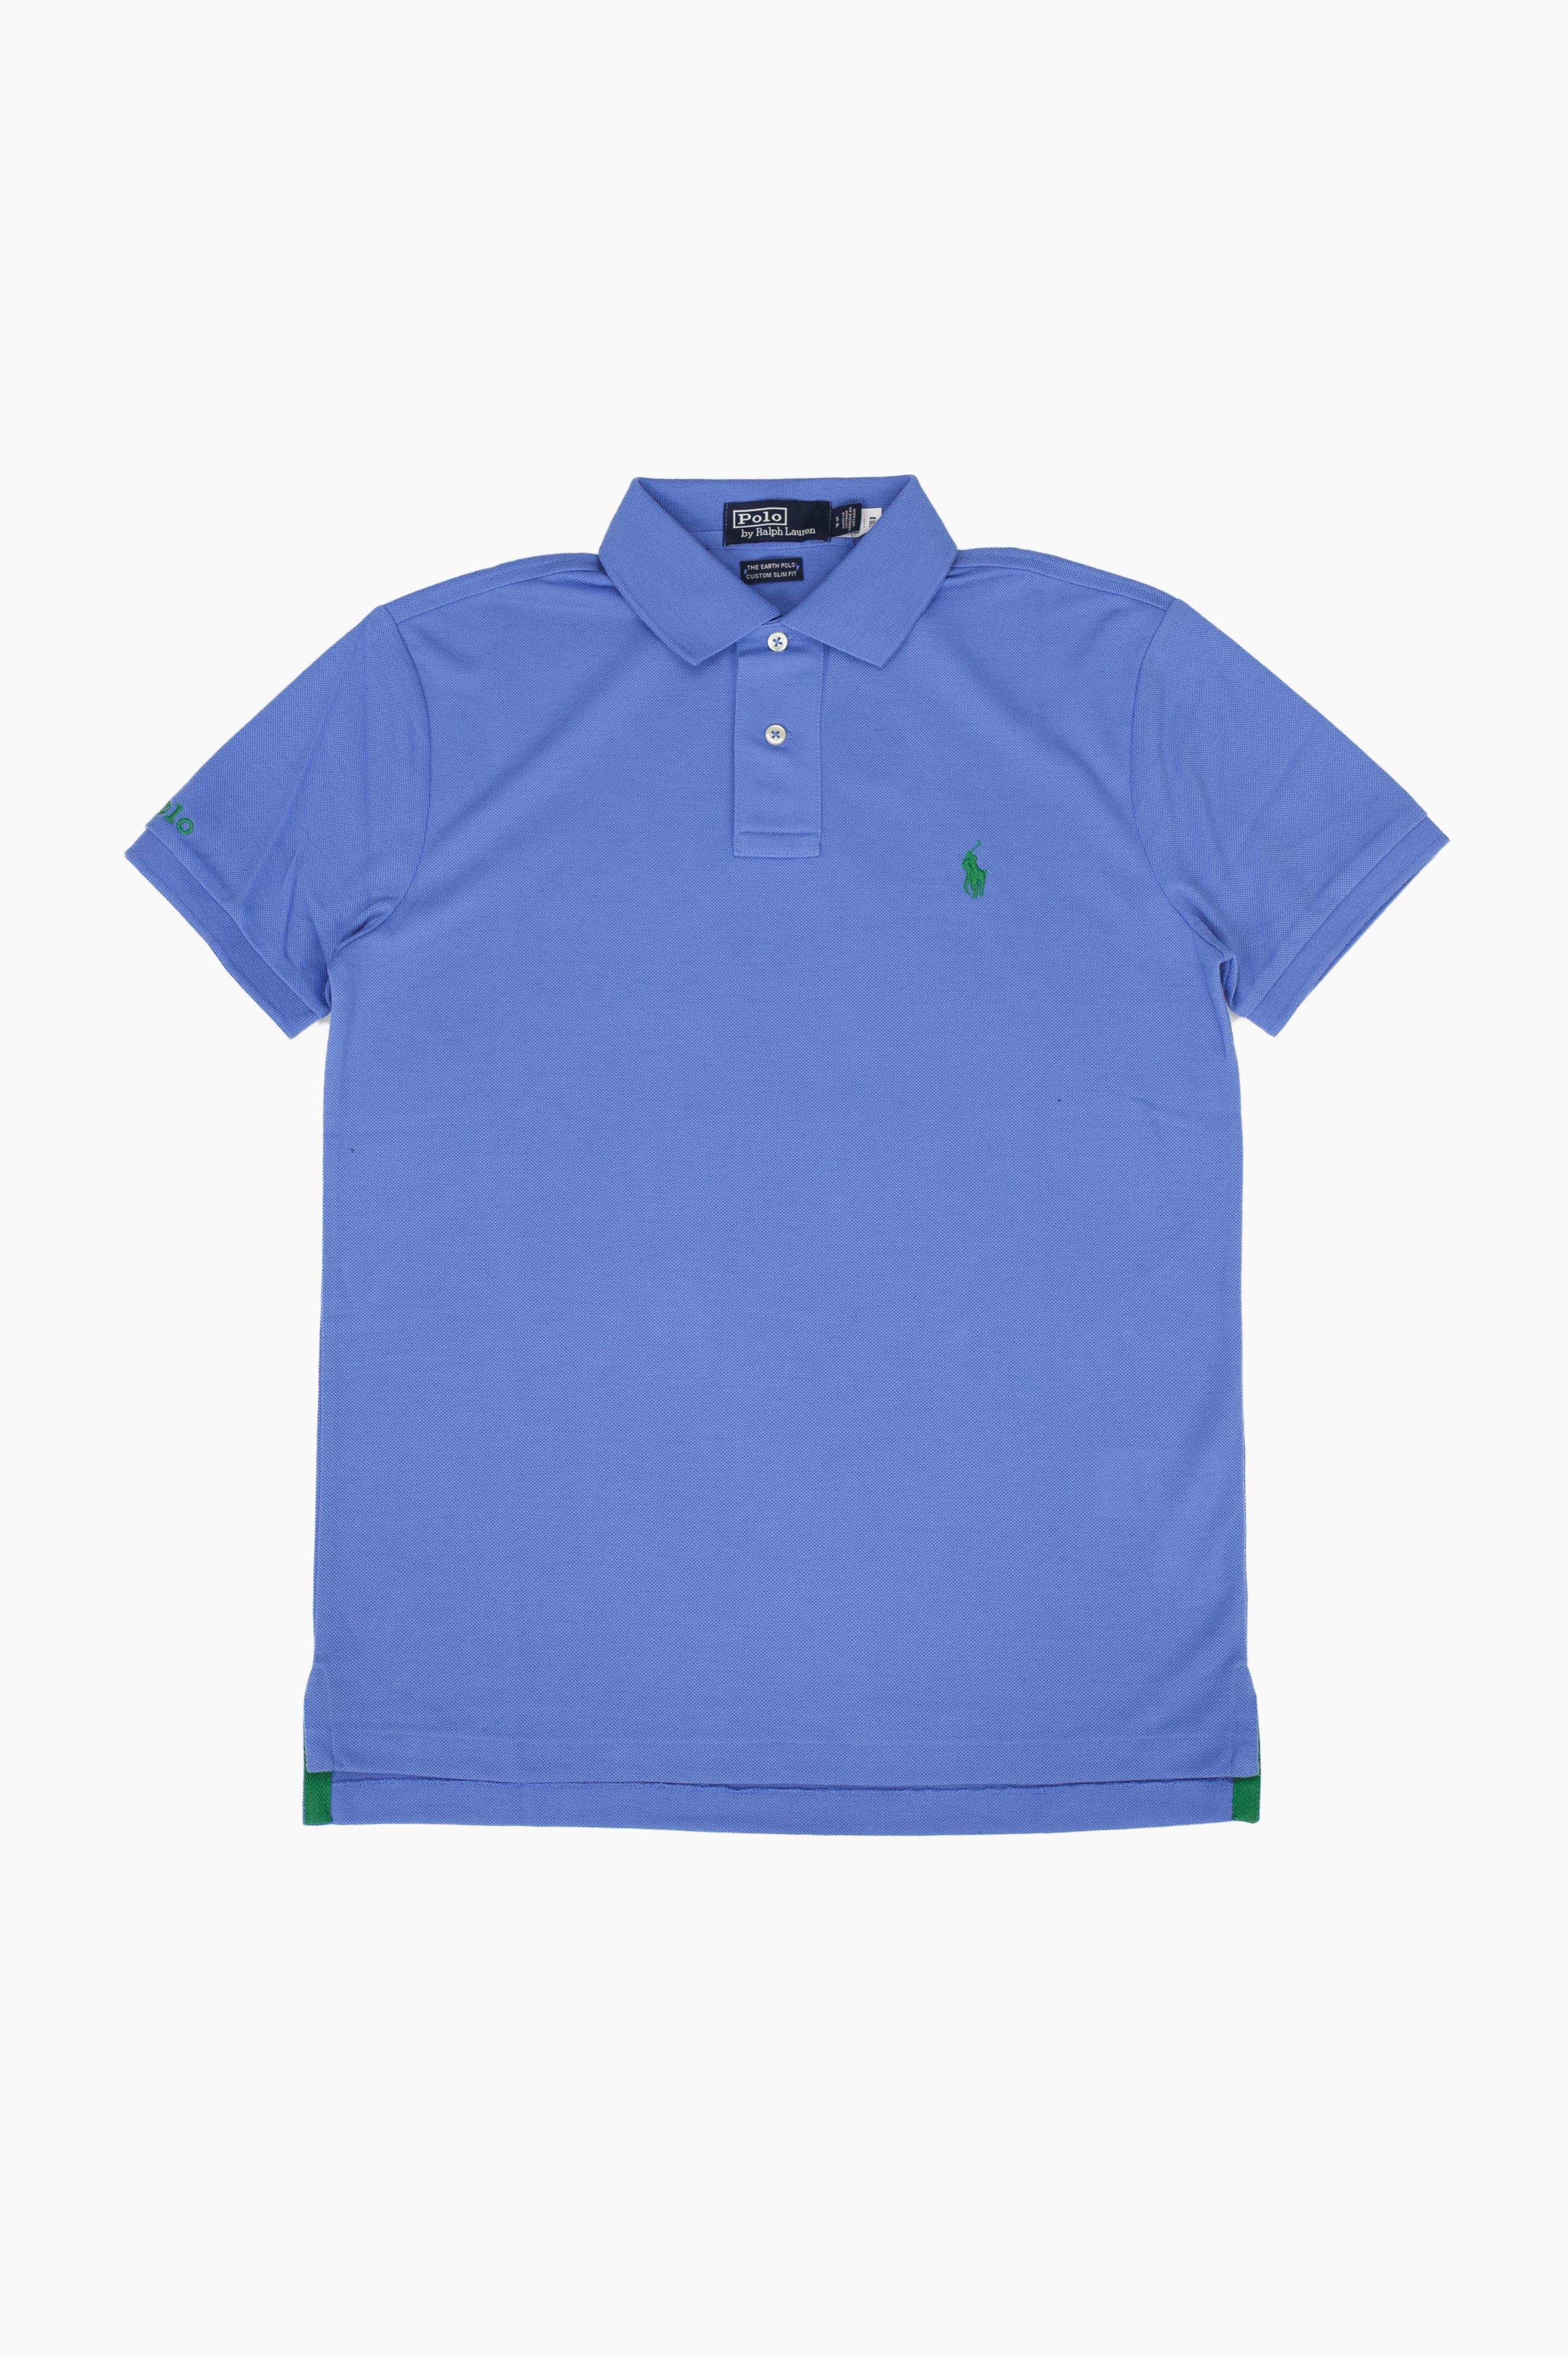 Earth Polo Shirt Blue